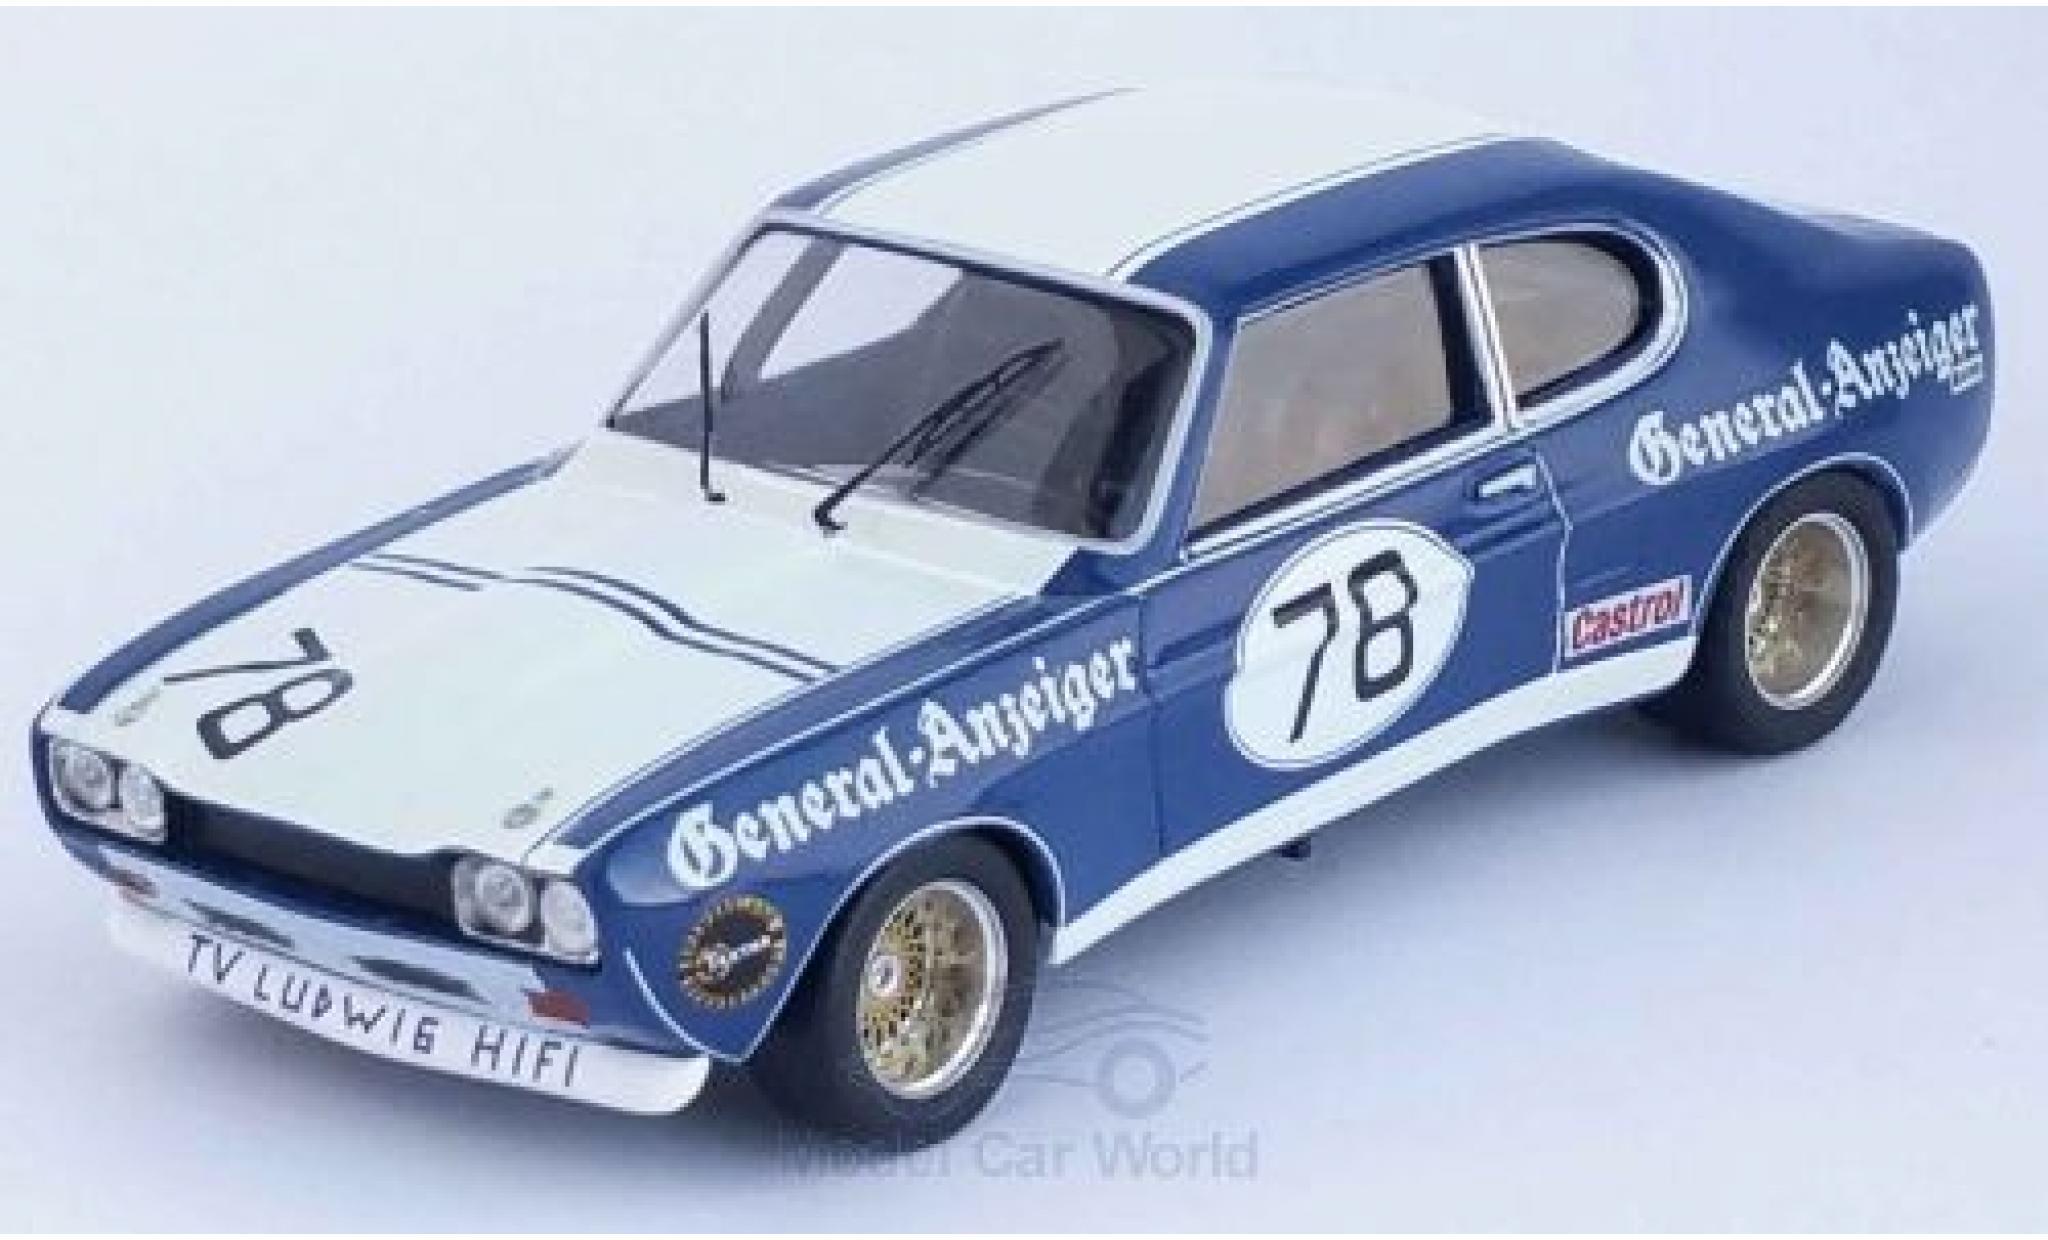 Ford Capri 1/43 Trofeu MKI RS 2600 No.78 General-Anzeiger DRM 1973 K.Ludwig